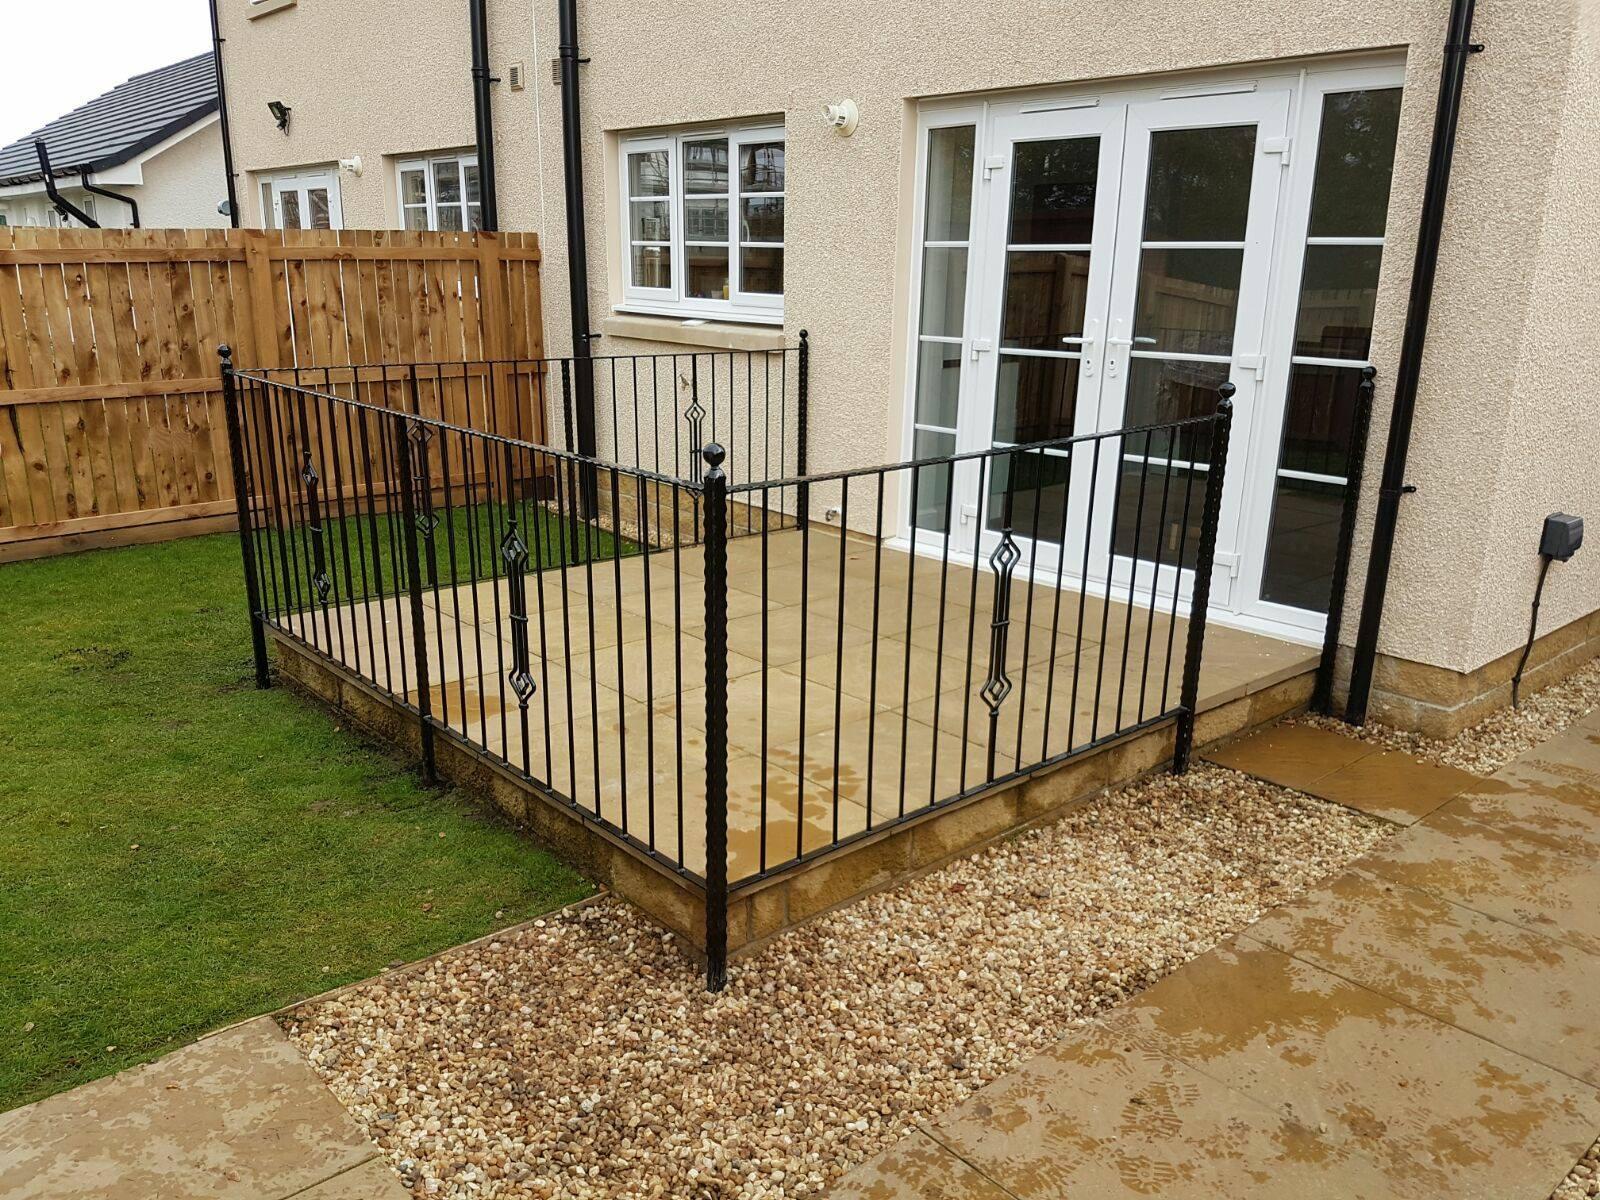 Stylish black metal railings to compliment customer's patio slabs in Barassie, Ayrshire. Custom built with diamond design, simple but elegant.